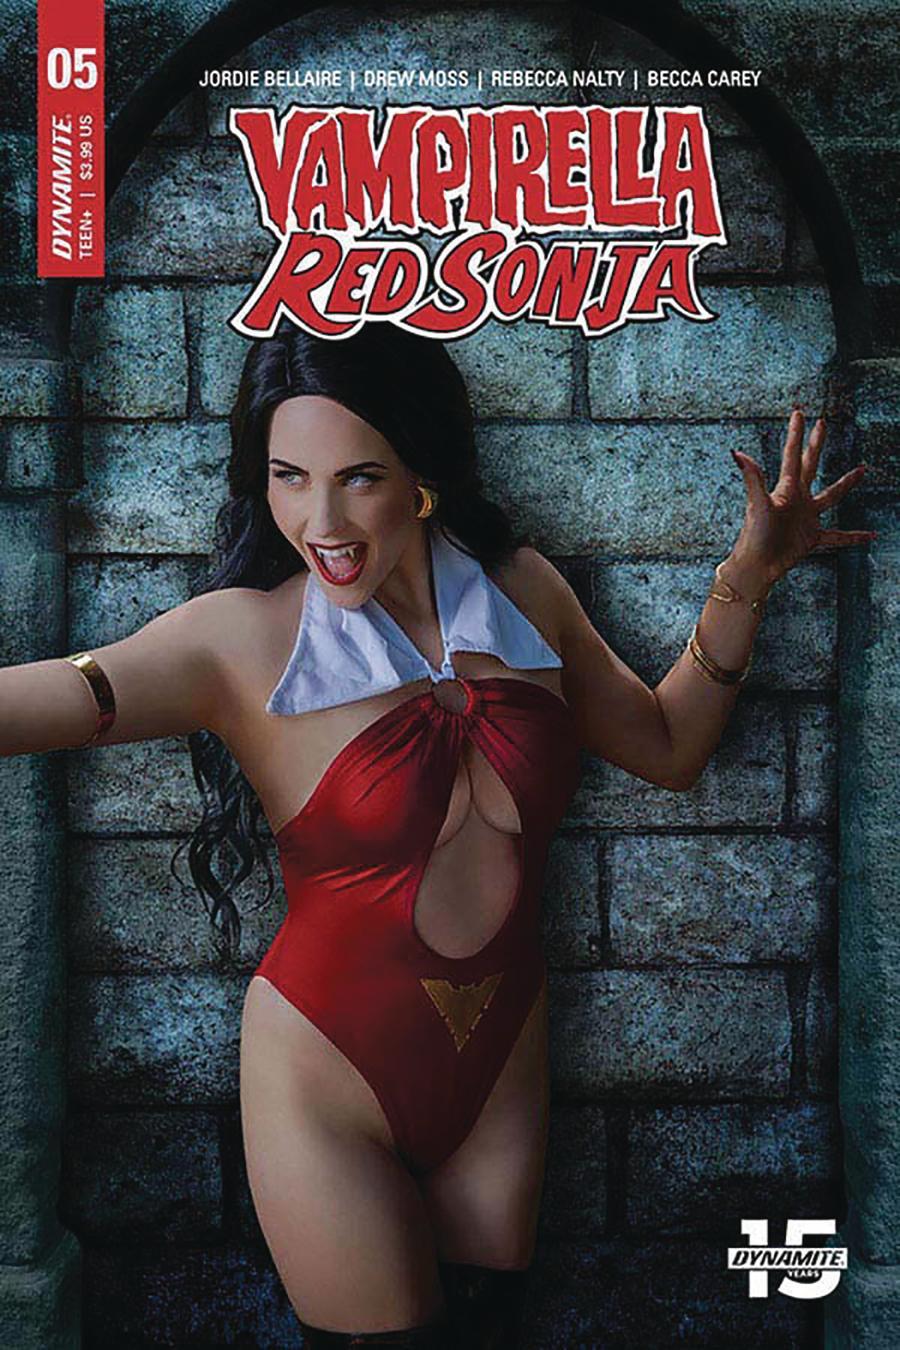 Vampirella Red Sonja #5 Cover E Variant Shannon Kingston Cosplay Photo Cover